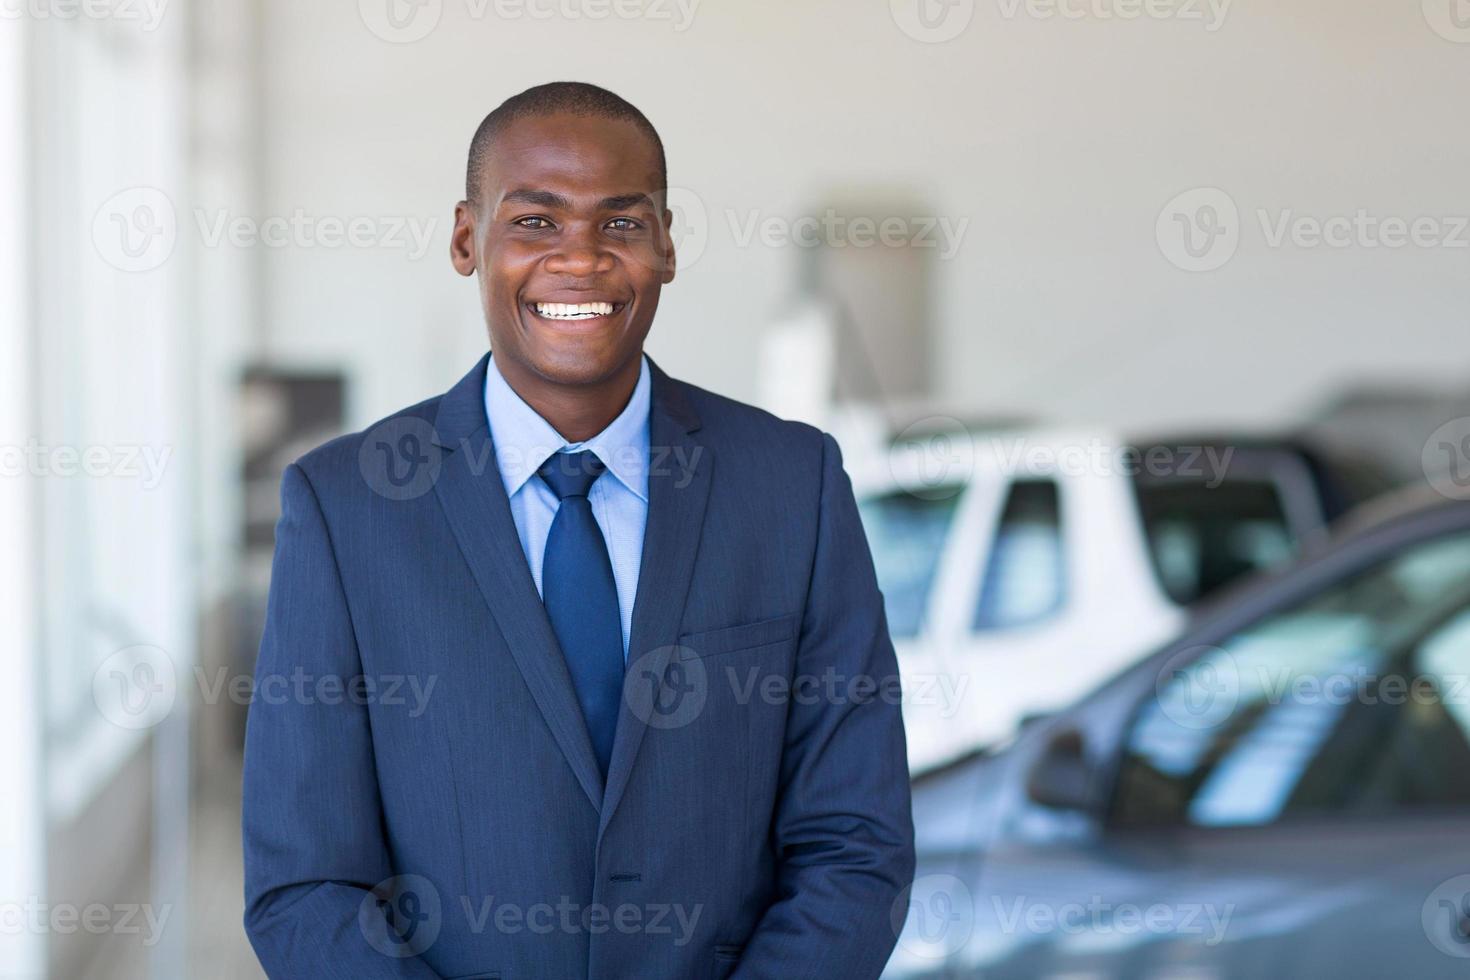 jeune, africaine, homme affaires, voiture, salle exposition photo